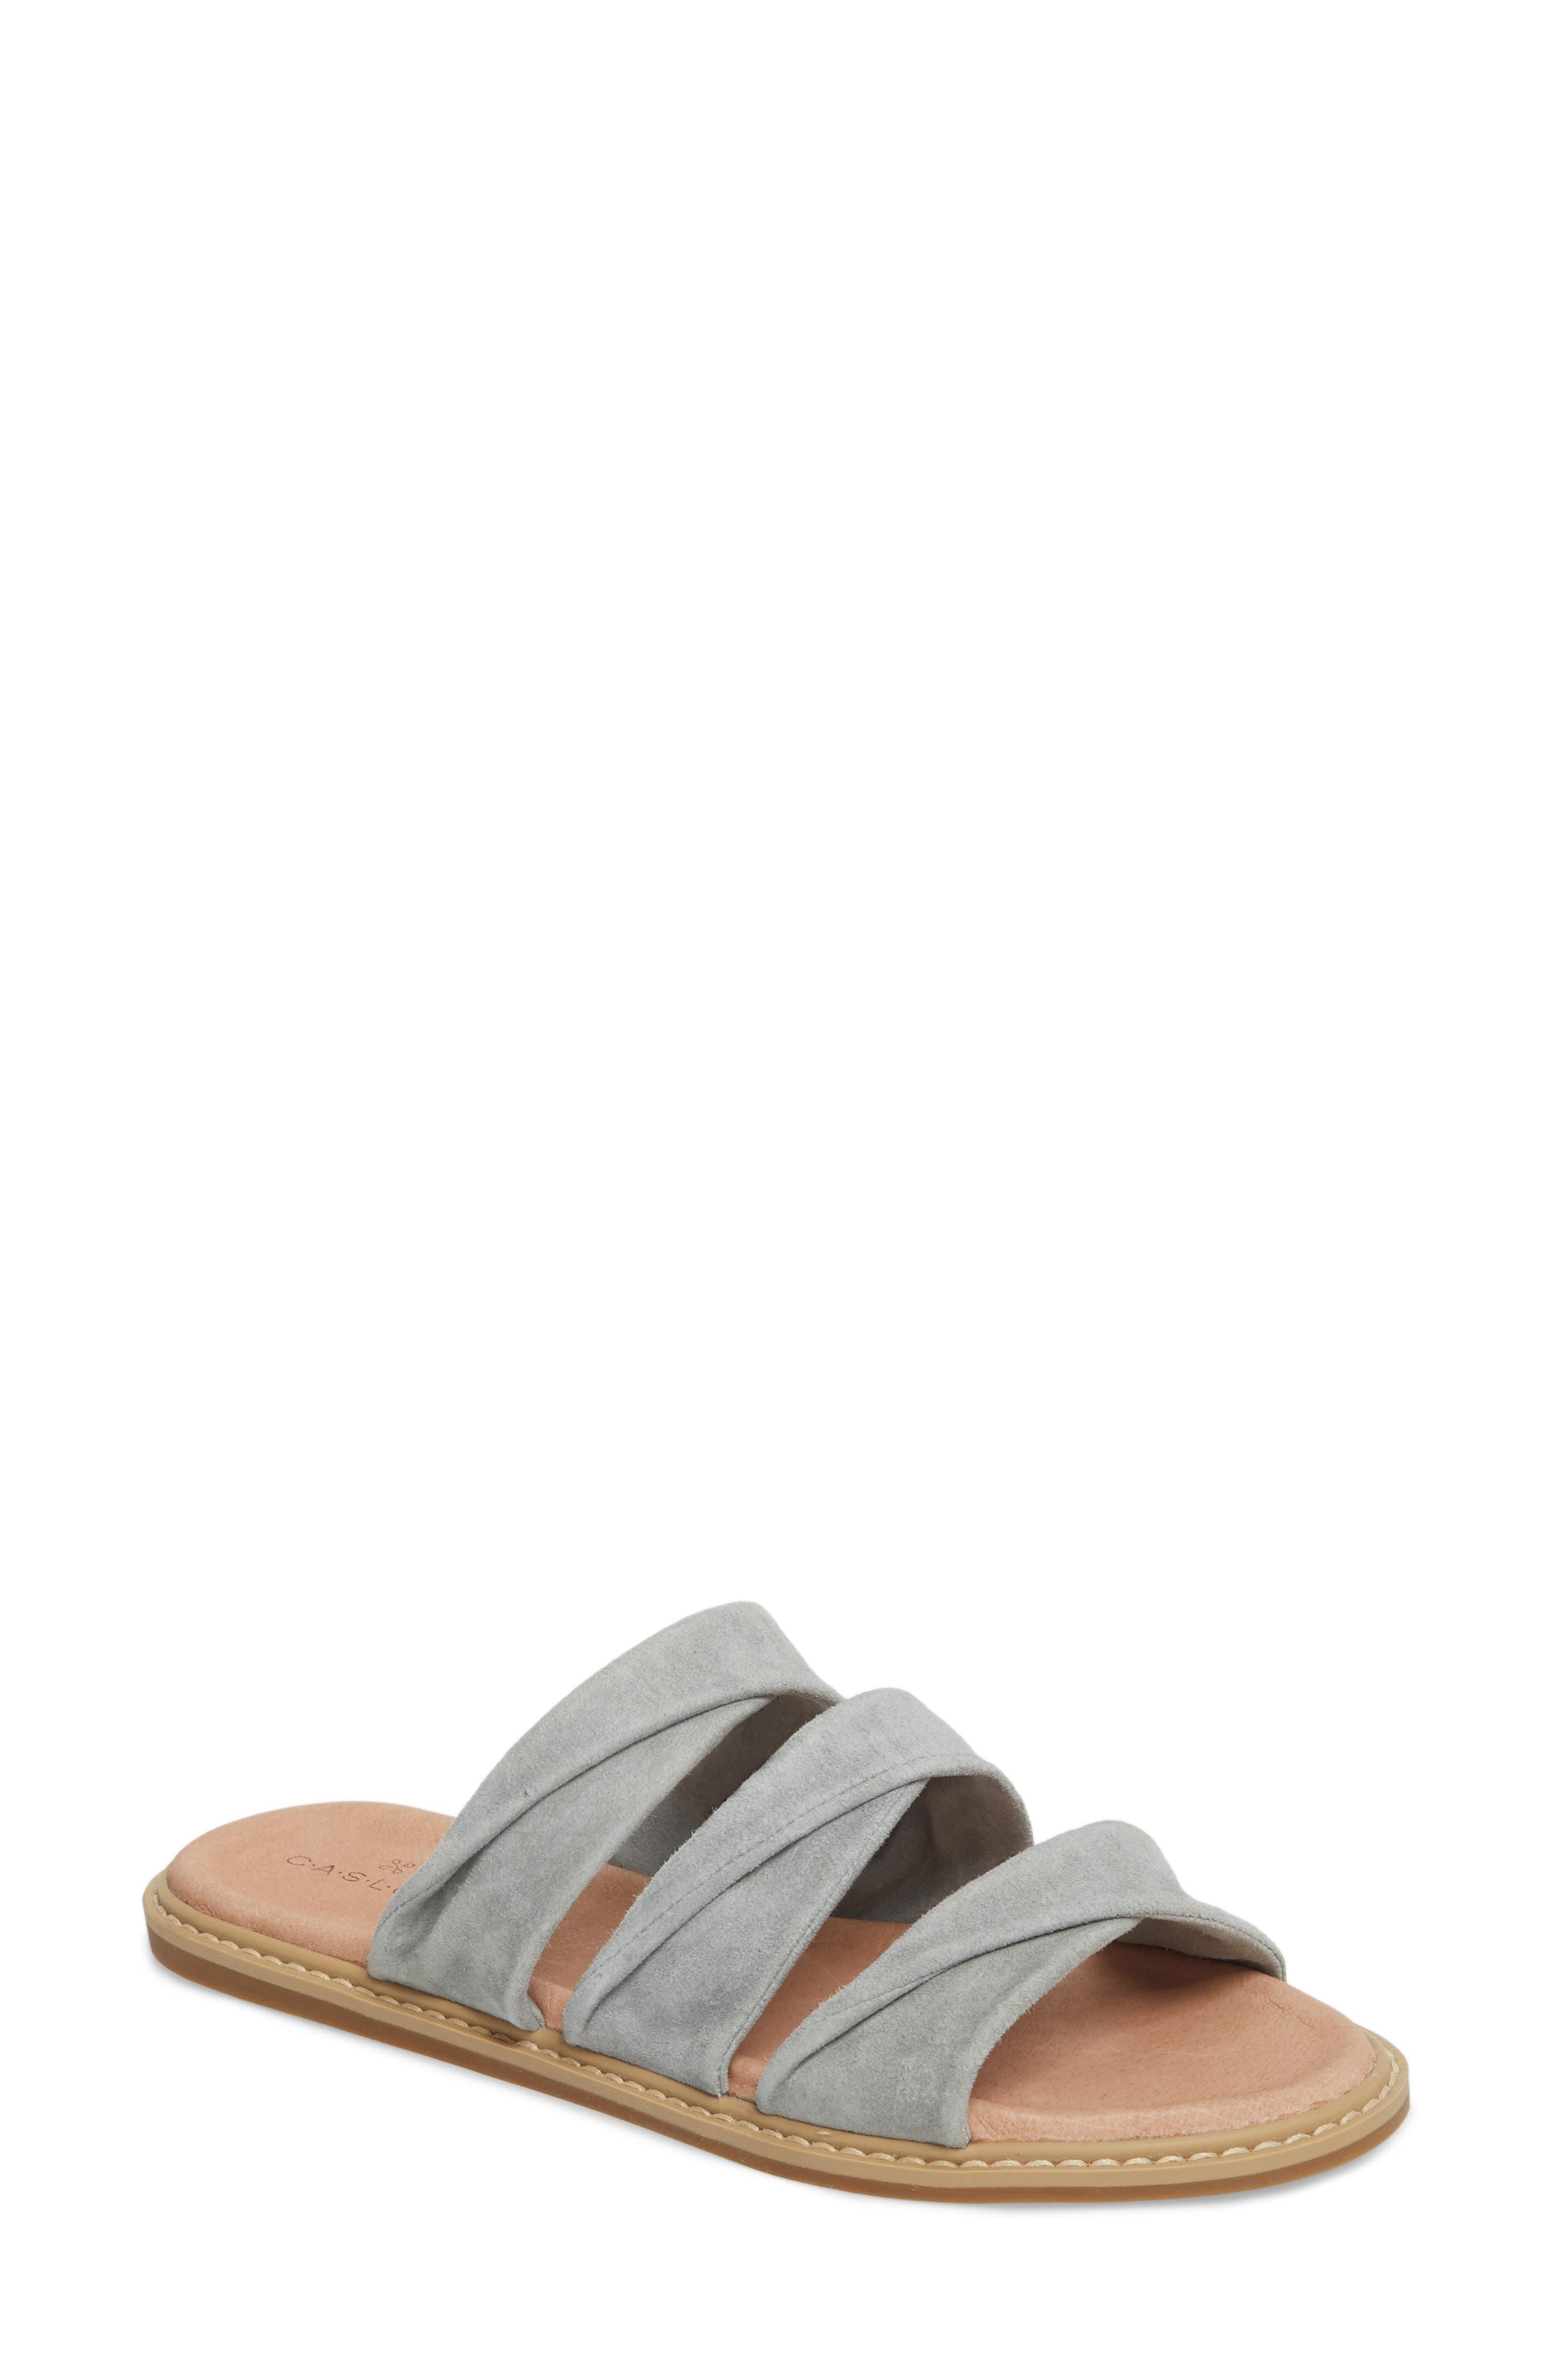 Cooper Slide Sandal,                             Main thumbnail 3, color,